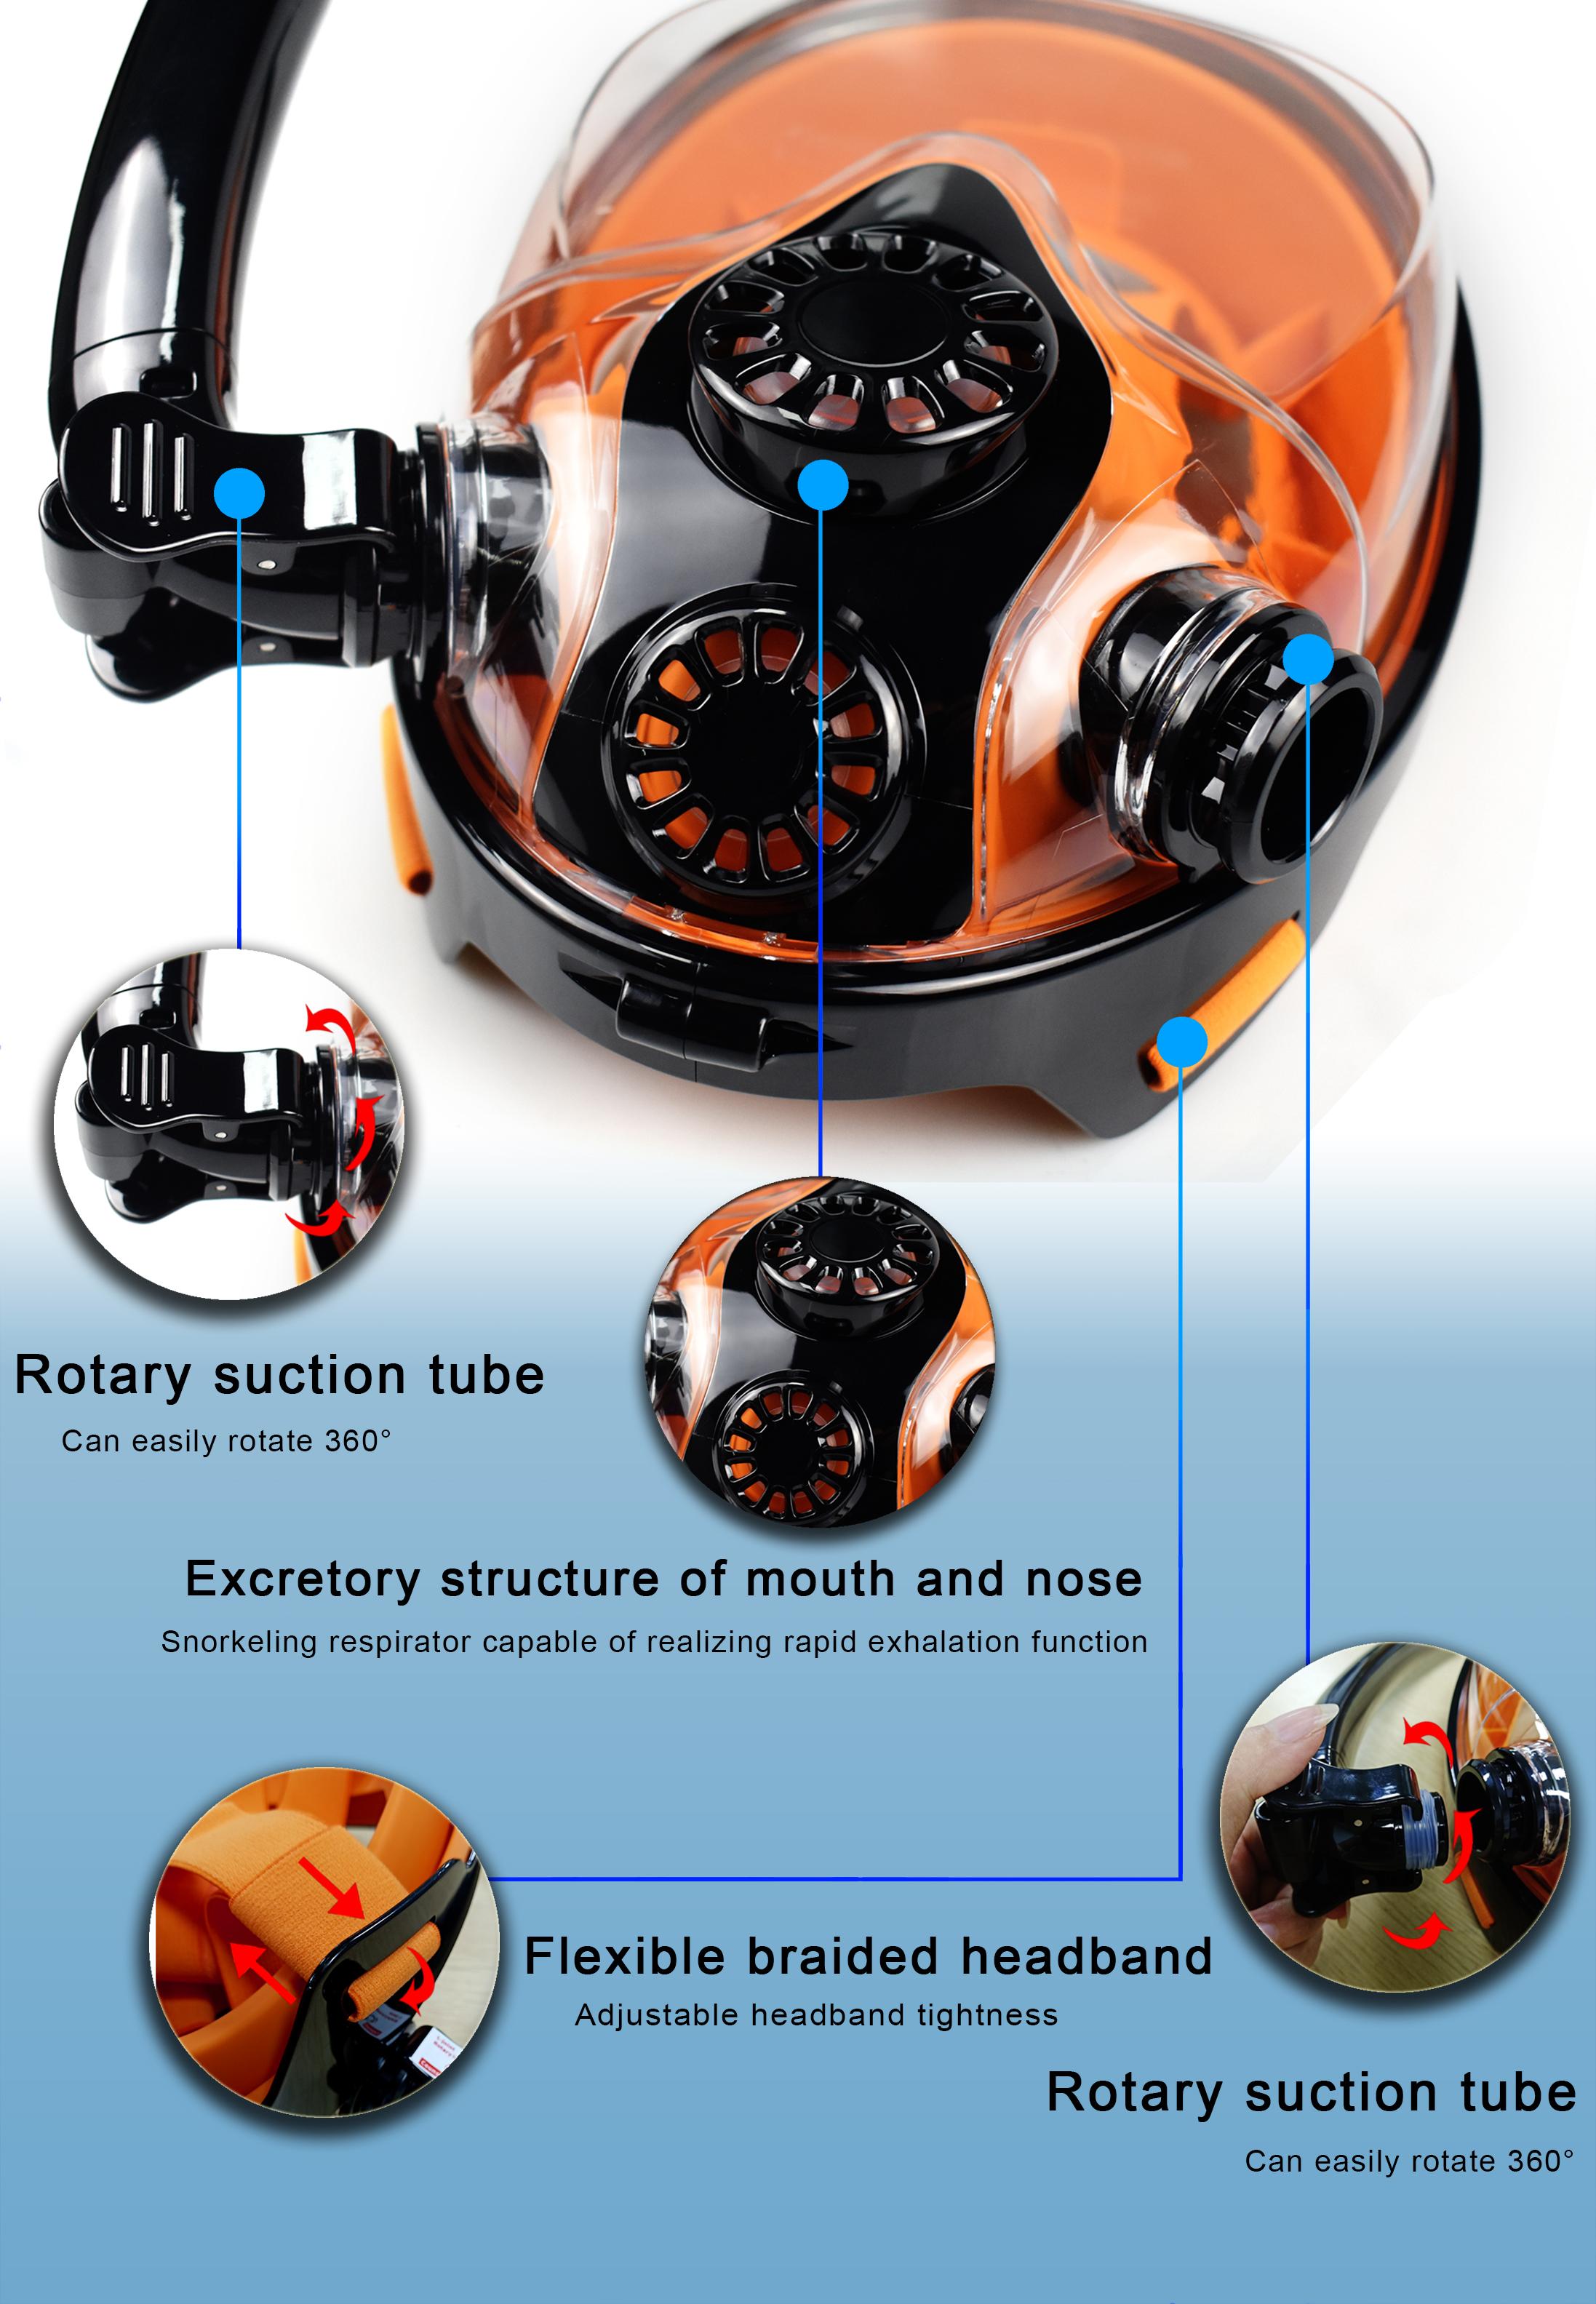 S5000 Plus Scuba Diving Tank Equipment, Mini Scuba Dive Cylinder with 20-25 Minutes Capability